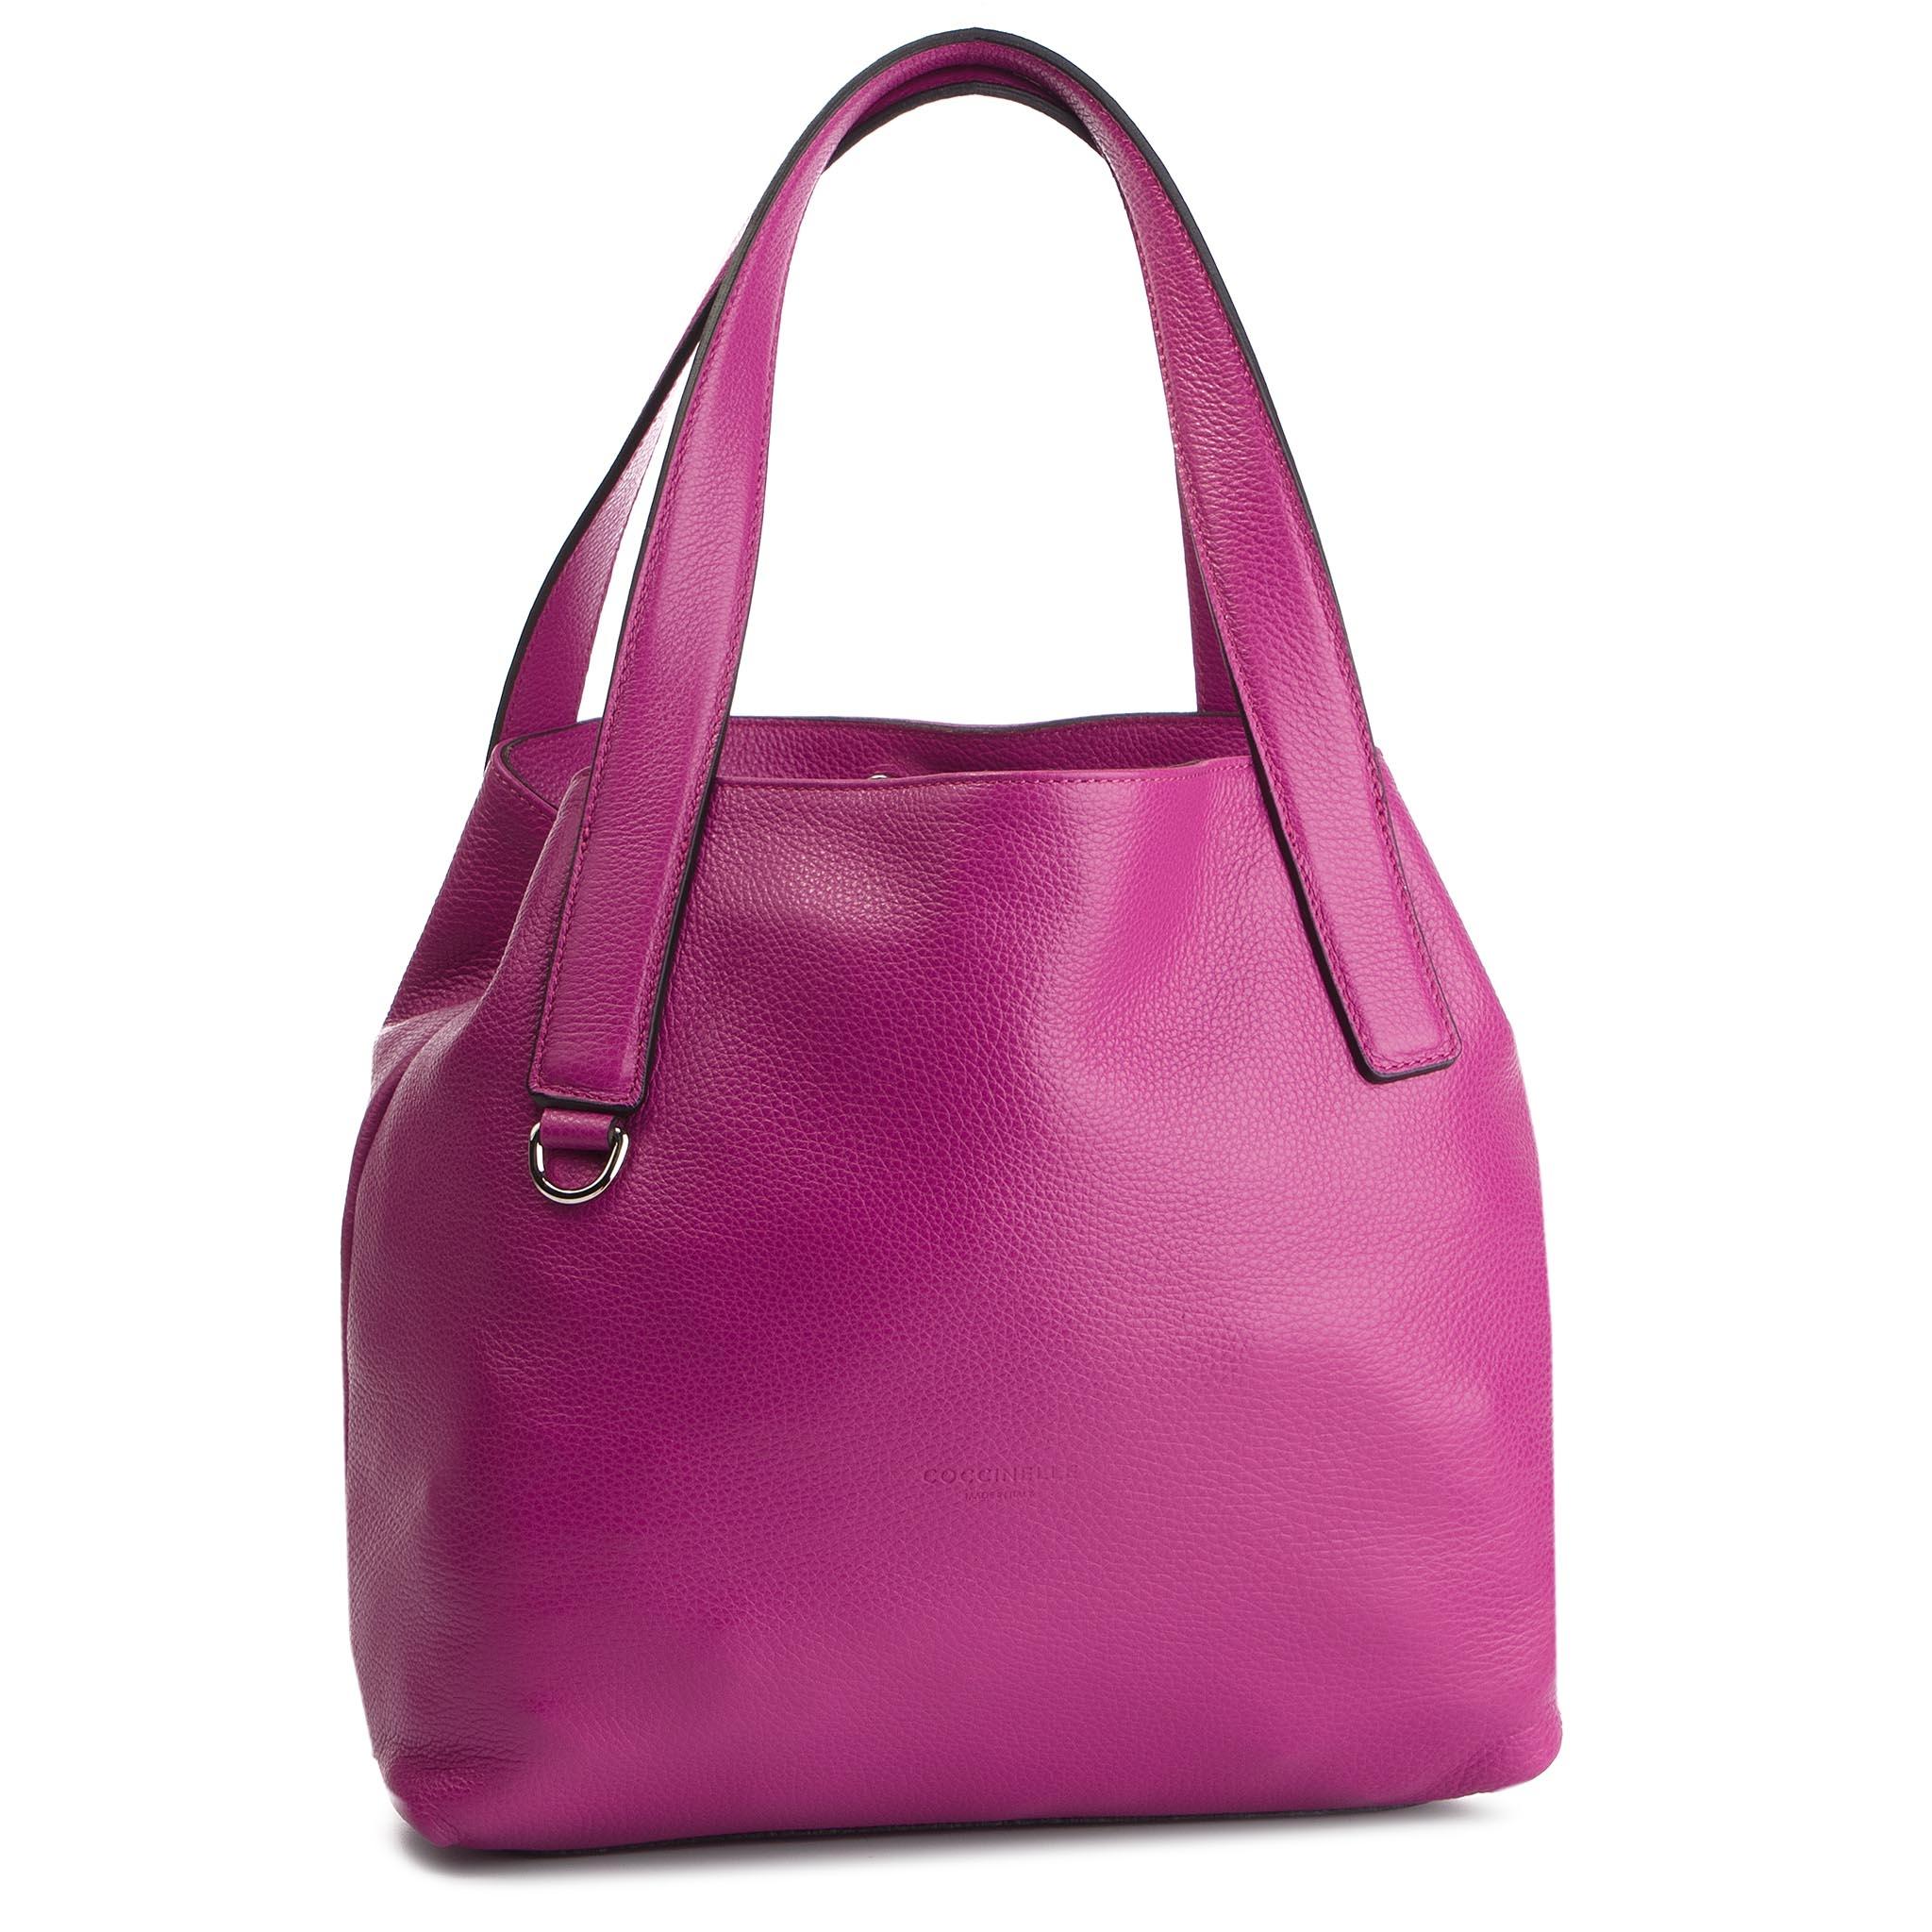 7f6163618638d Handbag COCCINELLE - DE5 Mila E1 DE5 11 02 01 Cosmic Lilac B05 ...